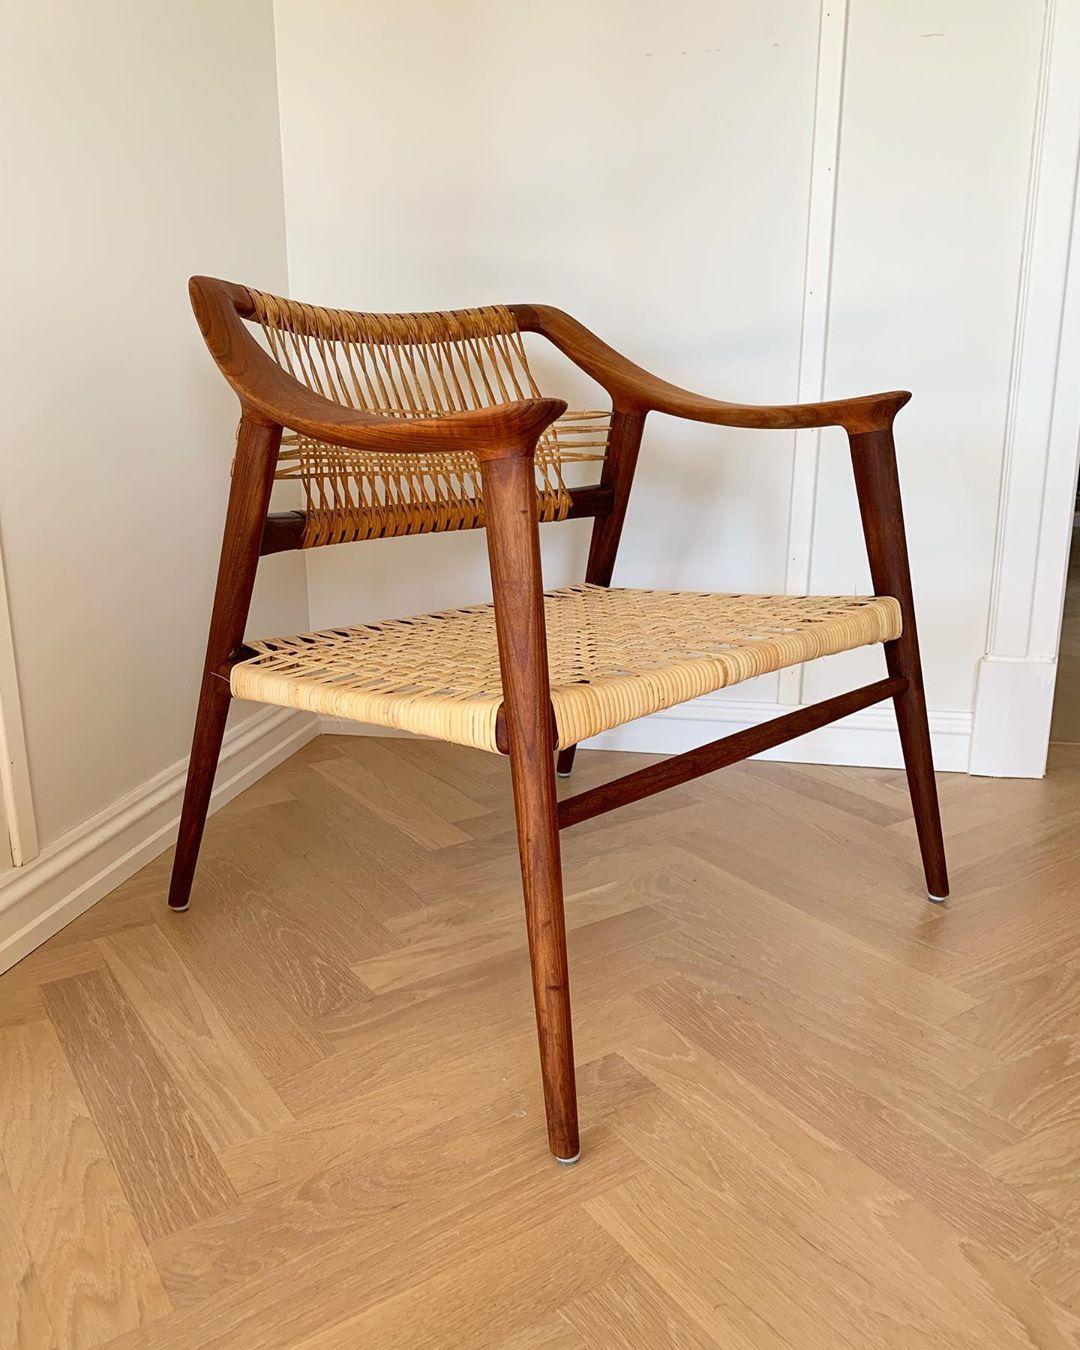 Bambi – Mod. 56/1 lounge chair